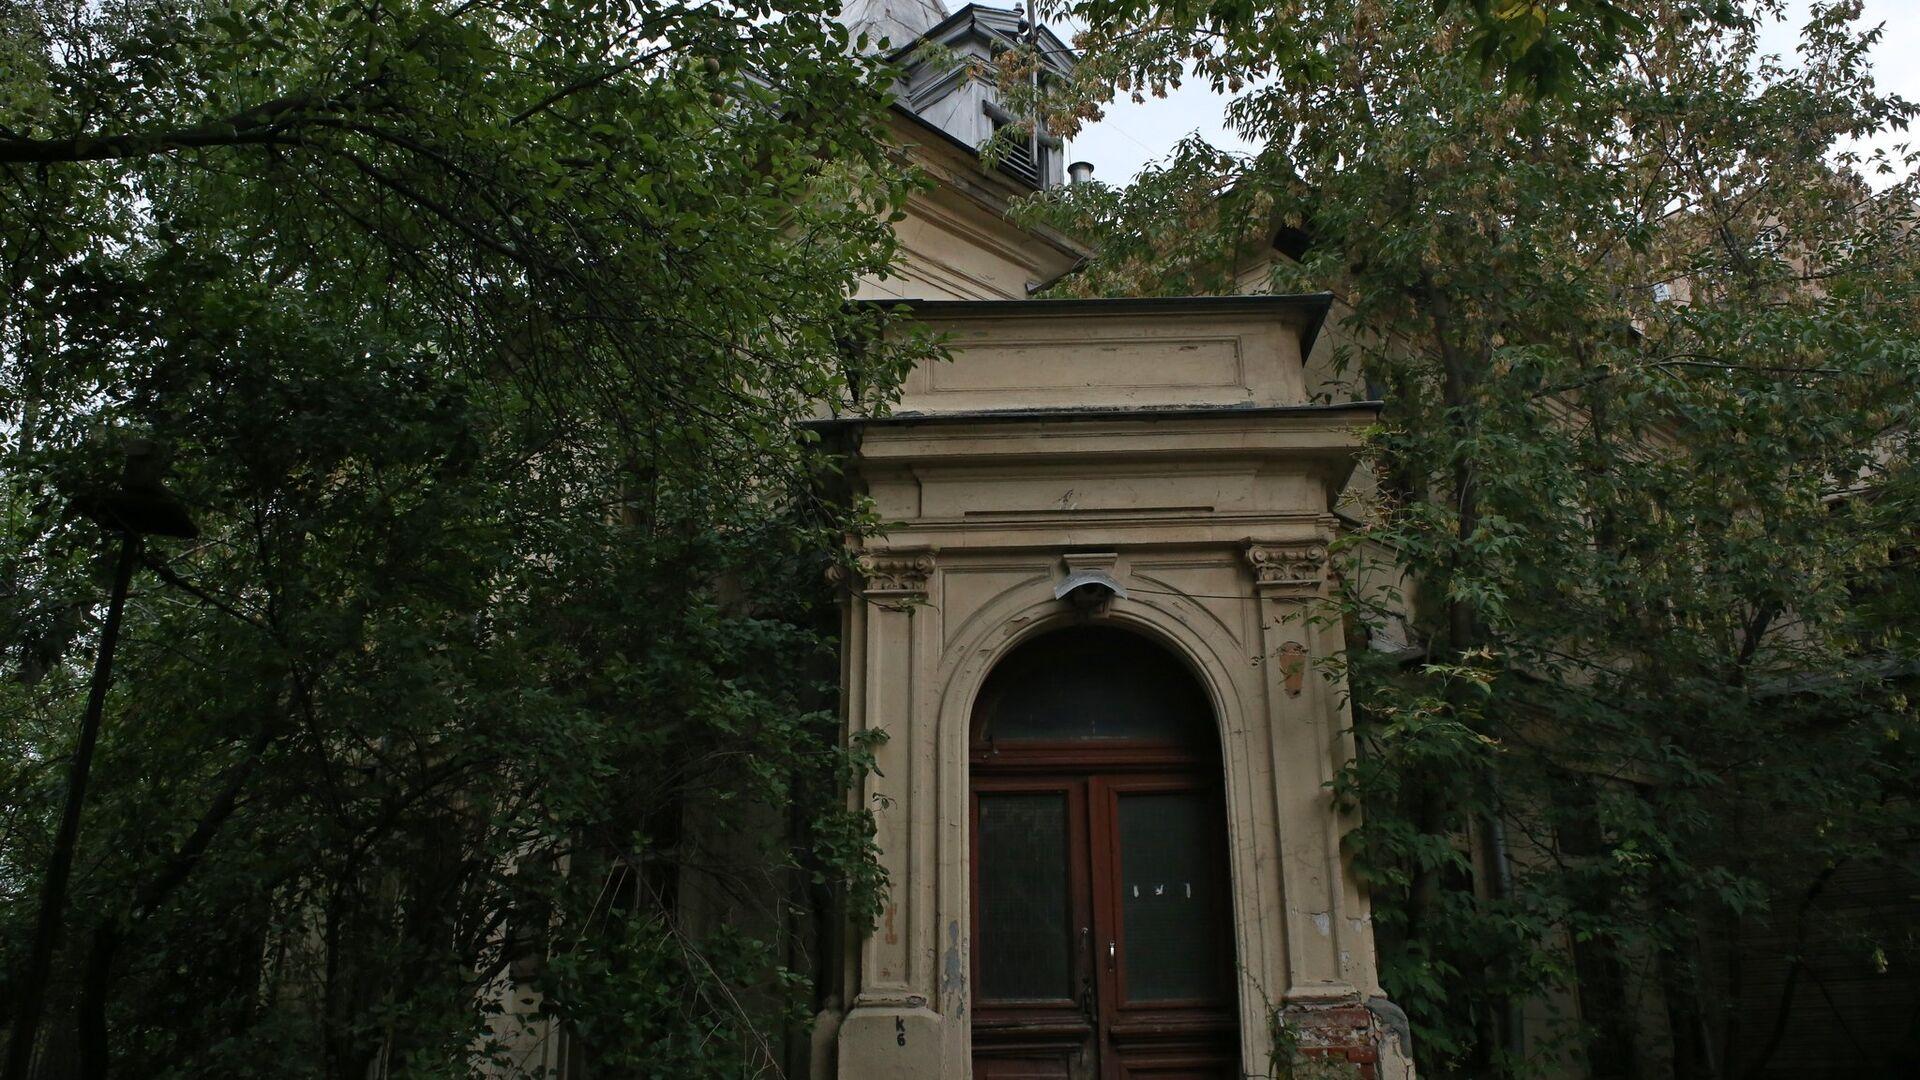 Особняк Снегирева на Плющихе  - РИА Новости, 1920, 16.10.2020